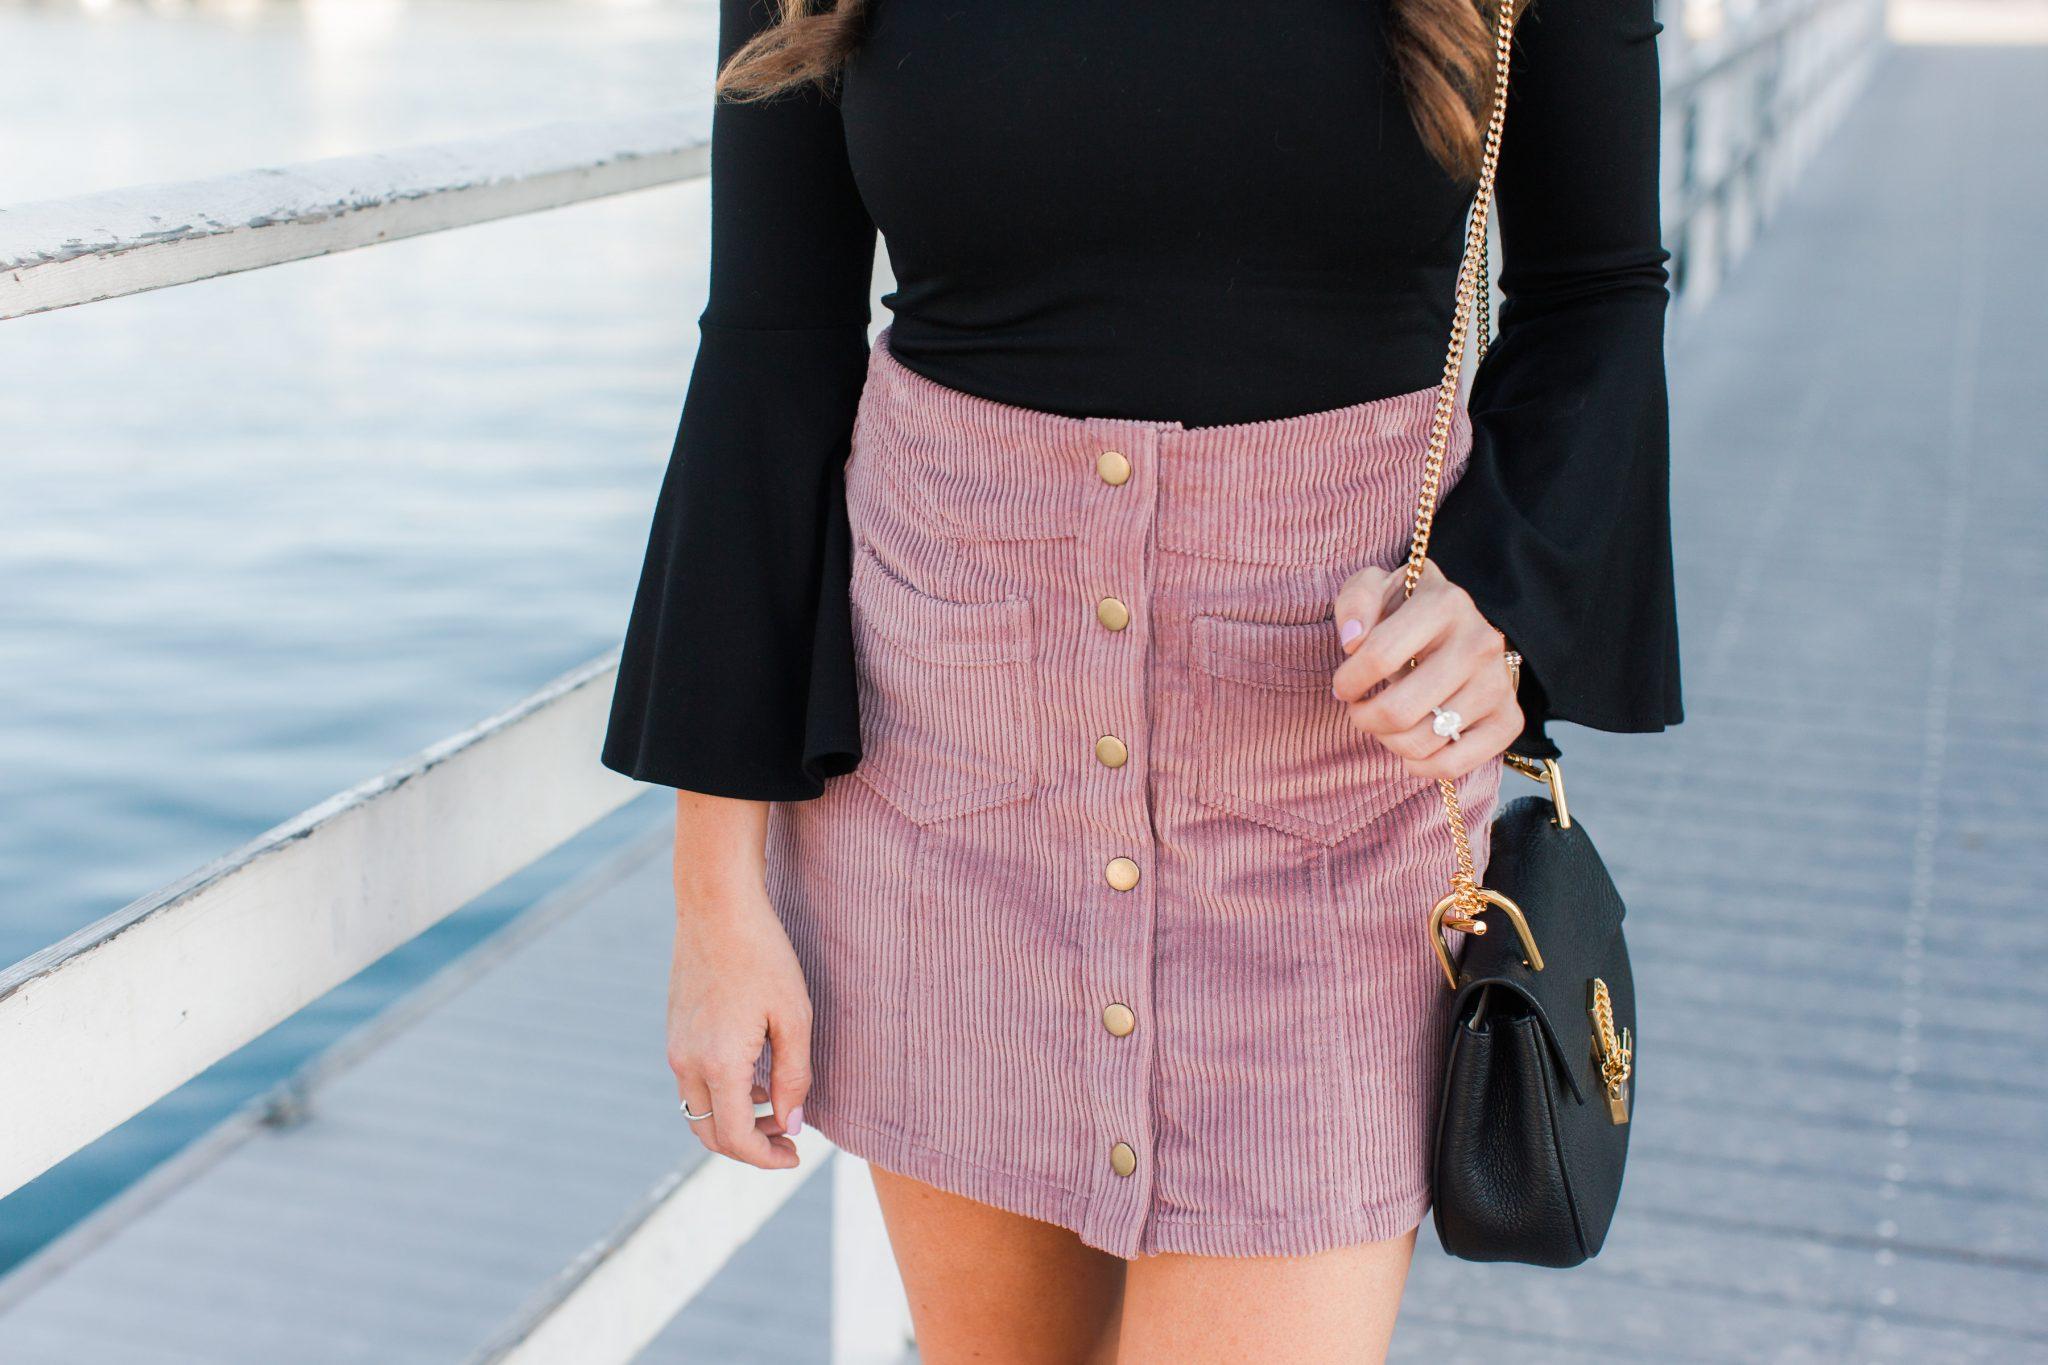 Corduroy Mini skirt styled by popular Orange County fashion blogger, Maxie Elle